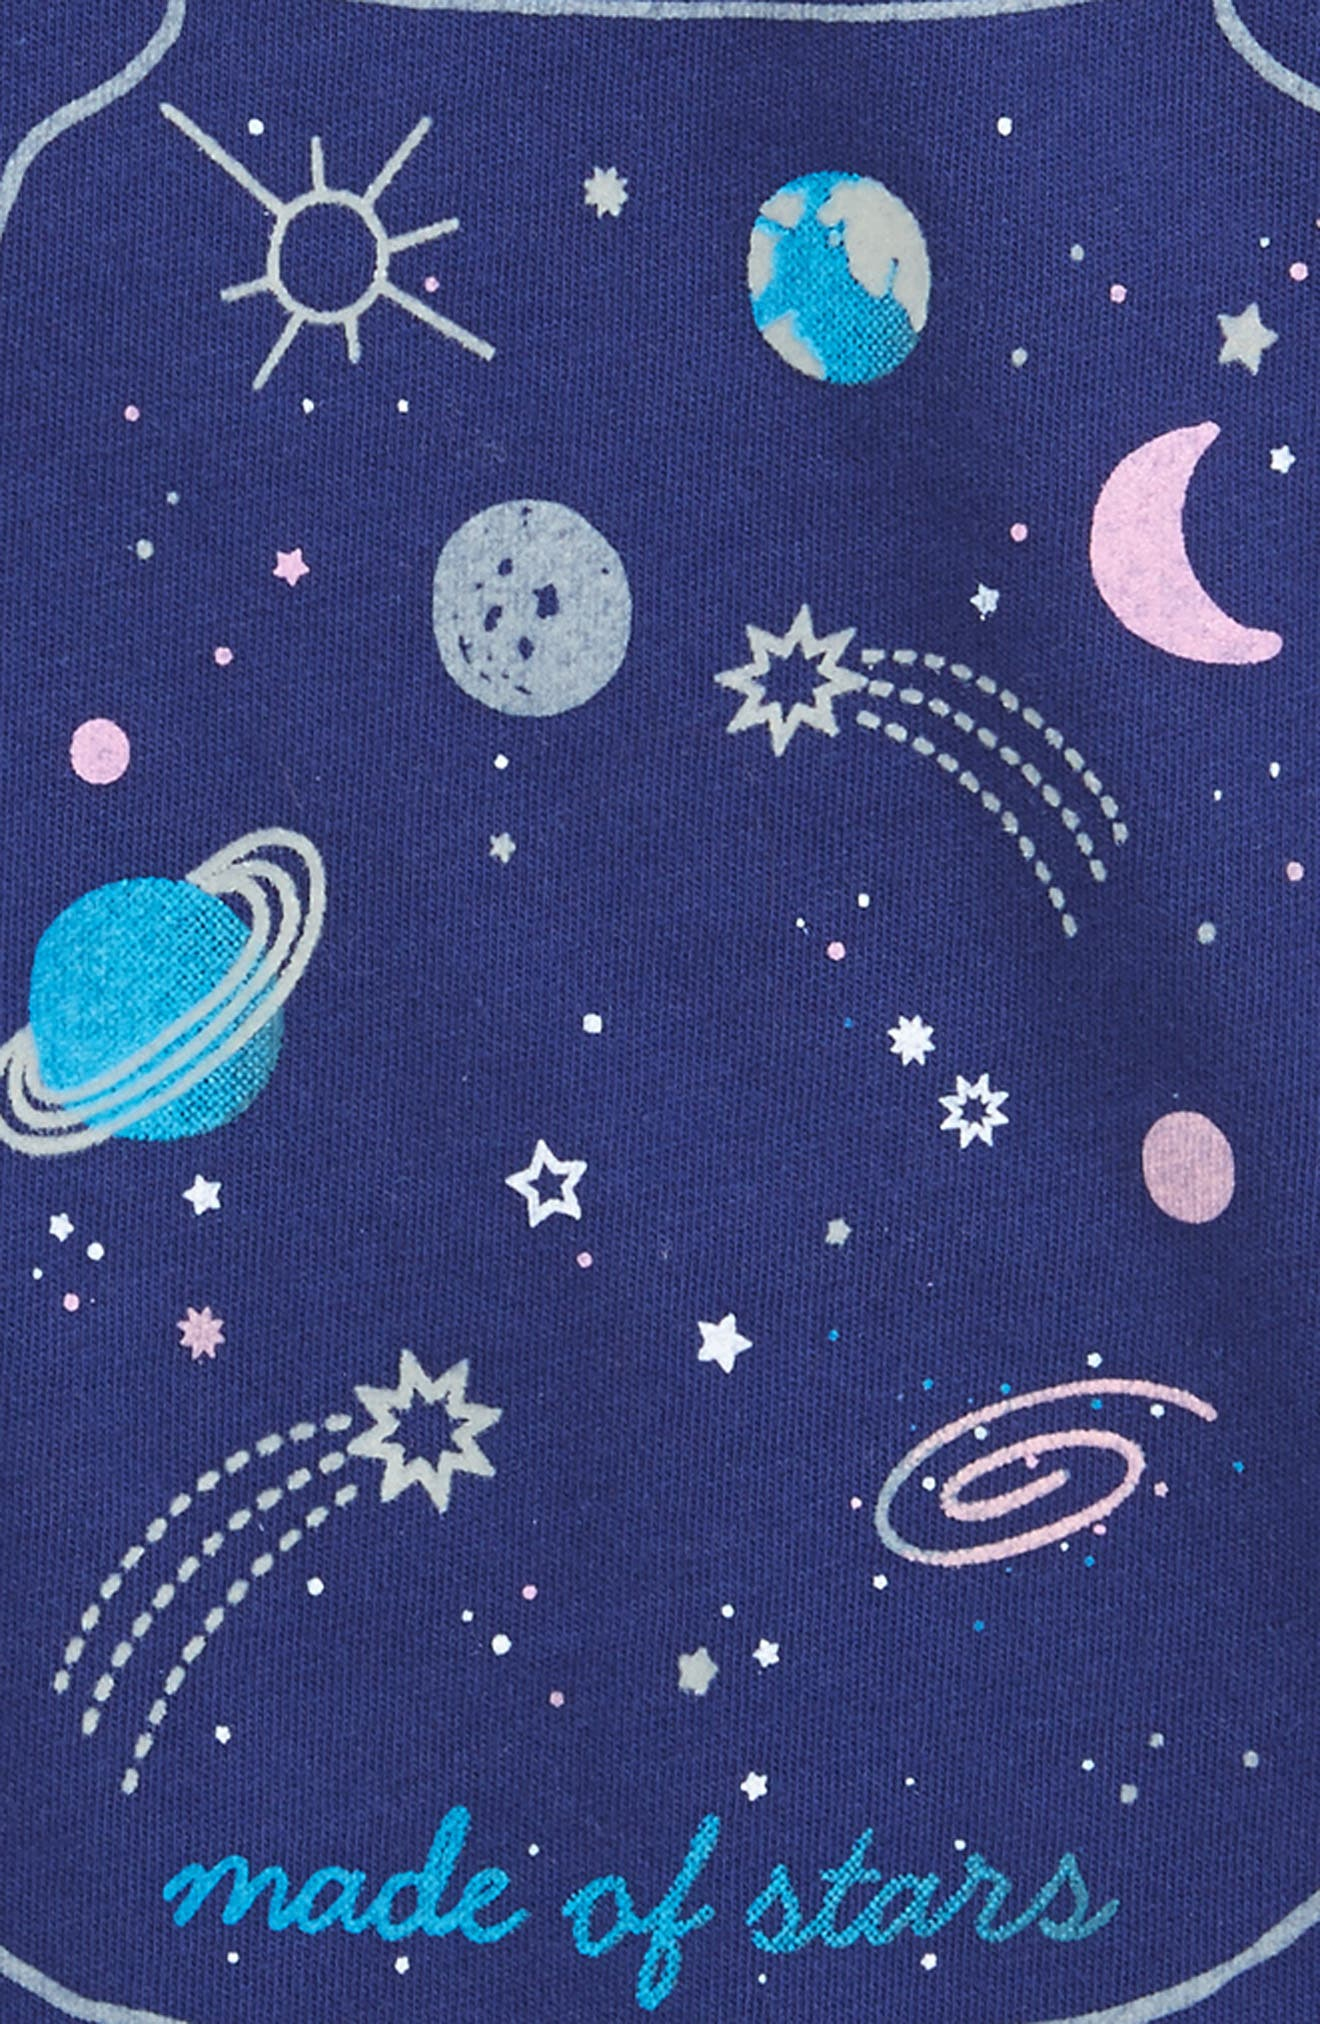 Jar of Stars Graphic Tee,                             Alternate thumbnail 4, color,                             410